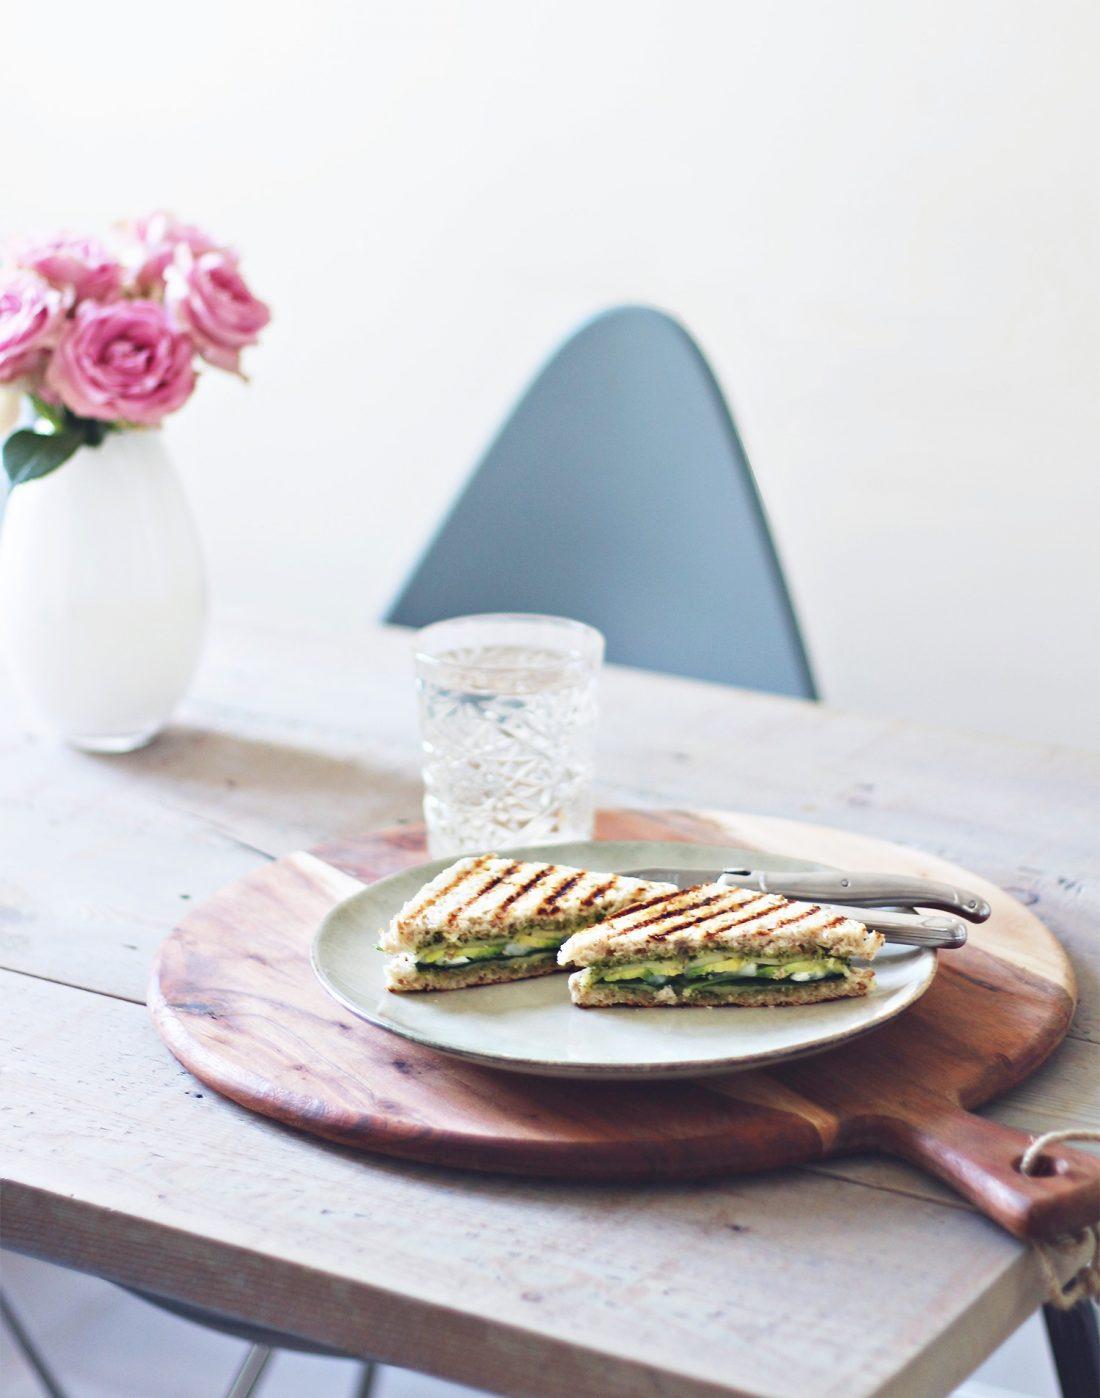 avocado-gedeost-sandwish@2x1.jpg